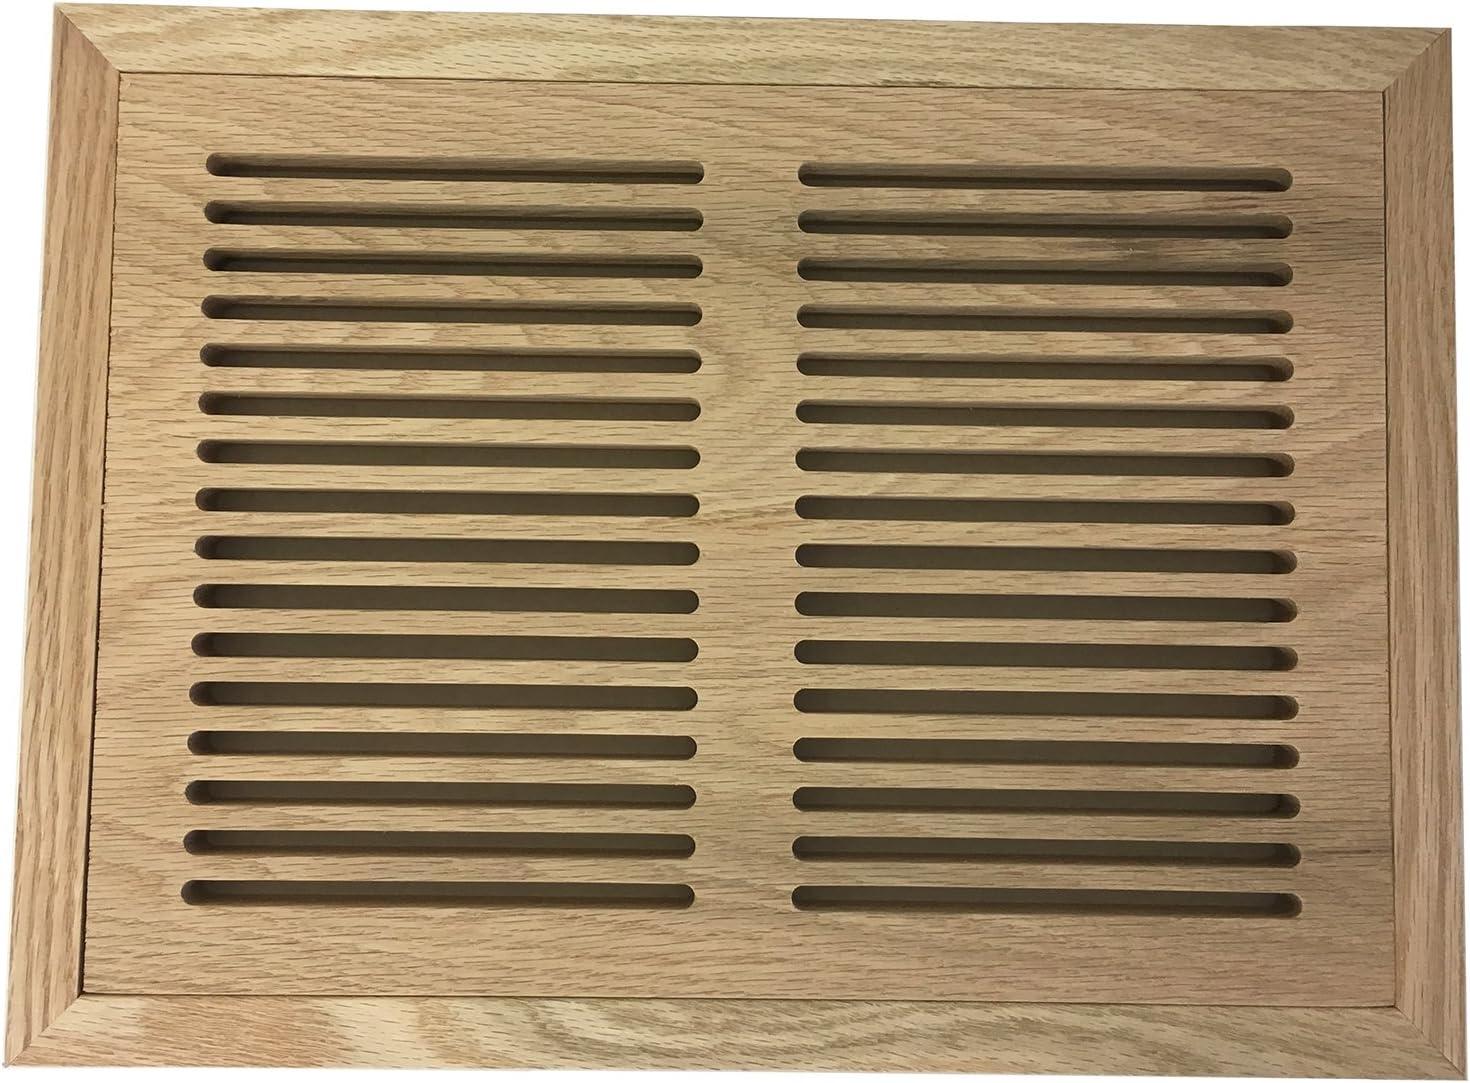 8 Ranking TOP17 Inch x 12 Super popular specialty store Red Oak Flush Hardwood Vent Moun Floor Register